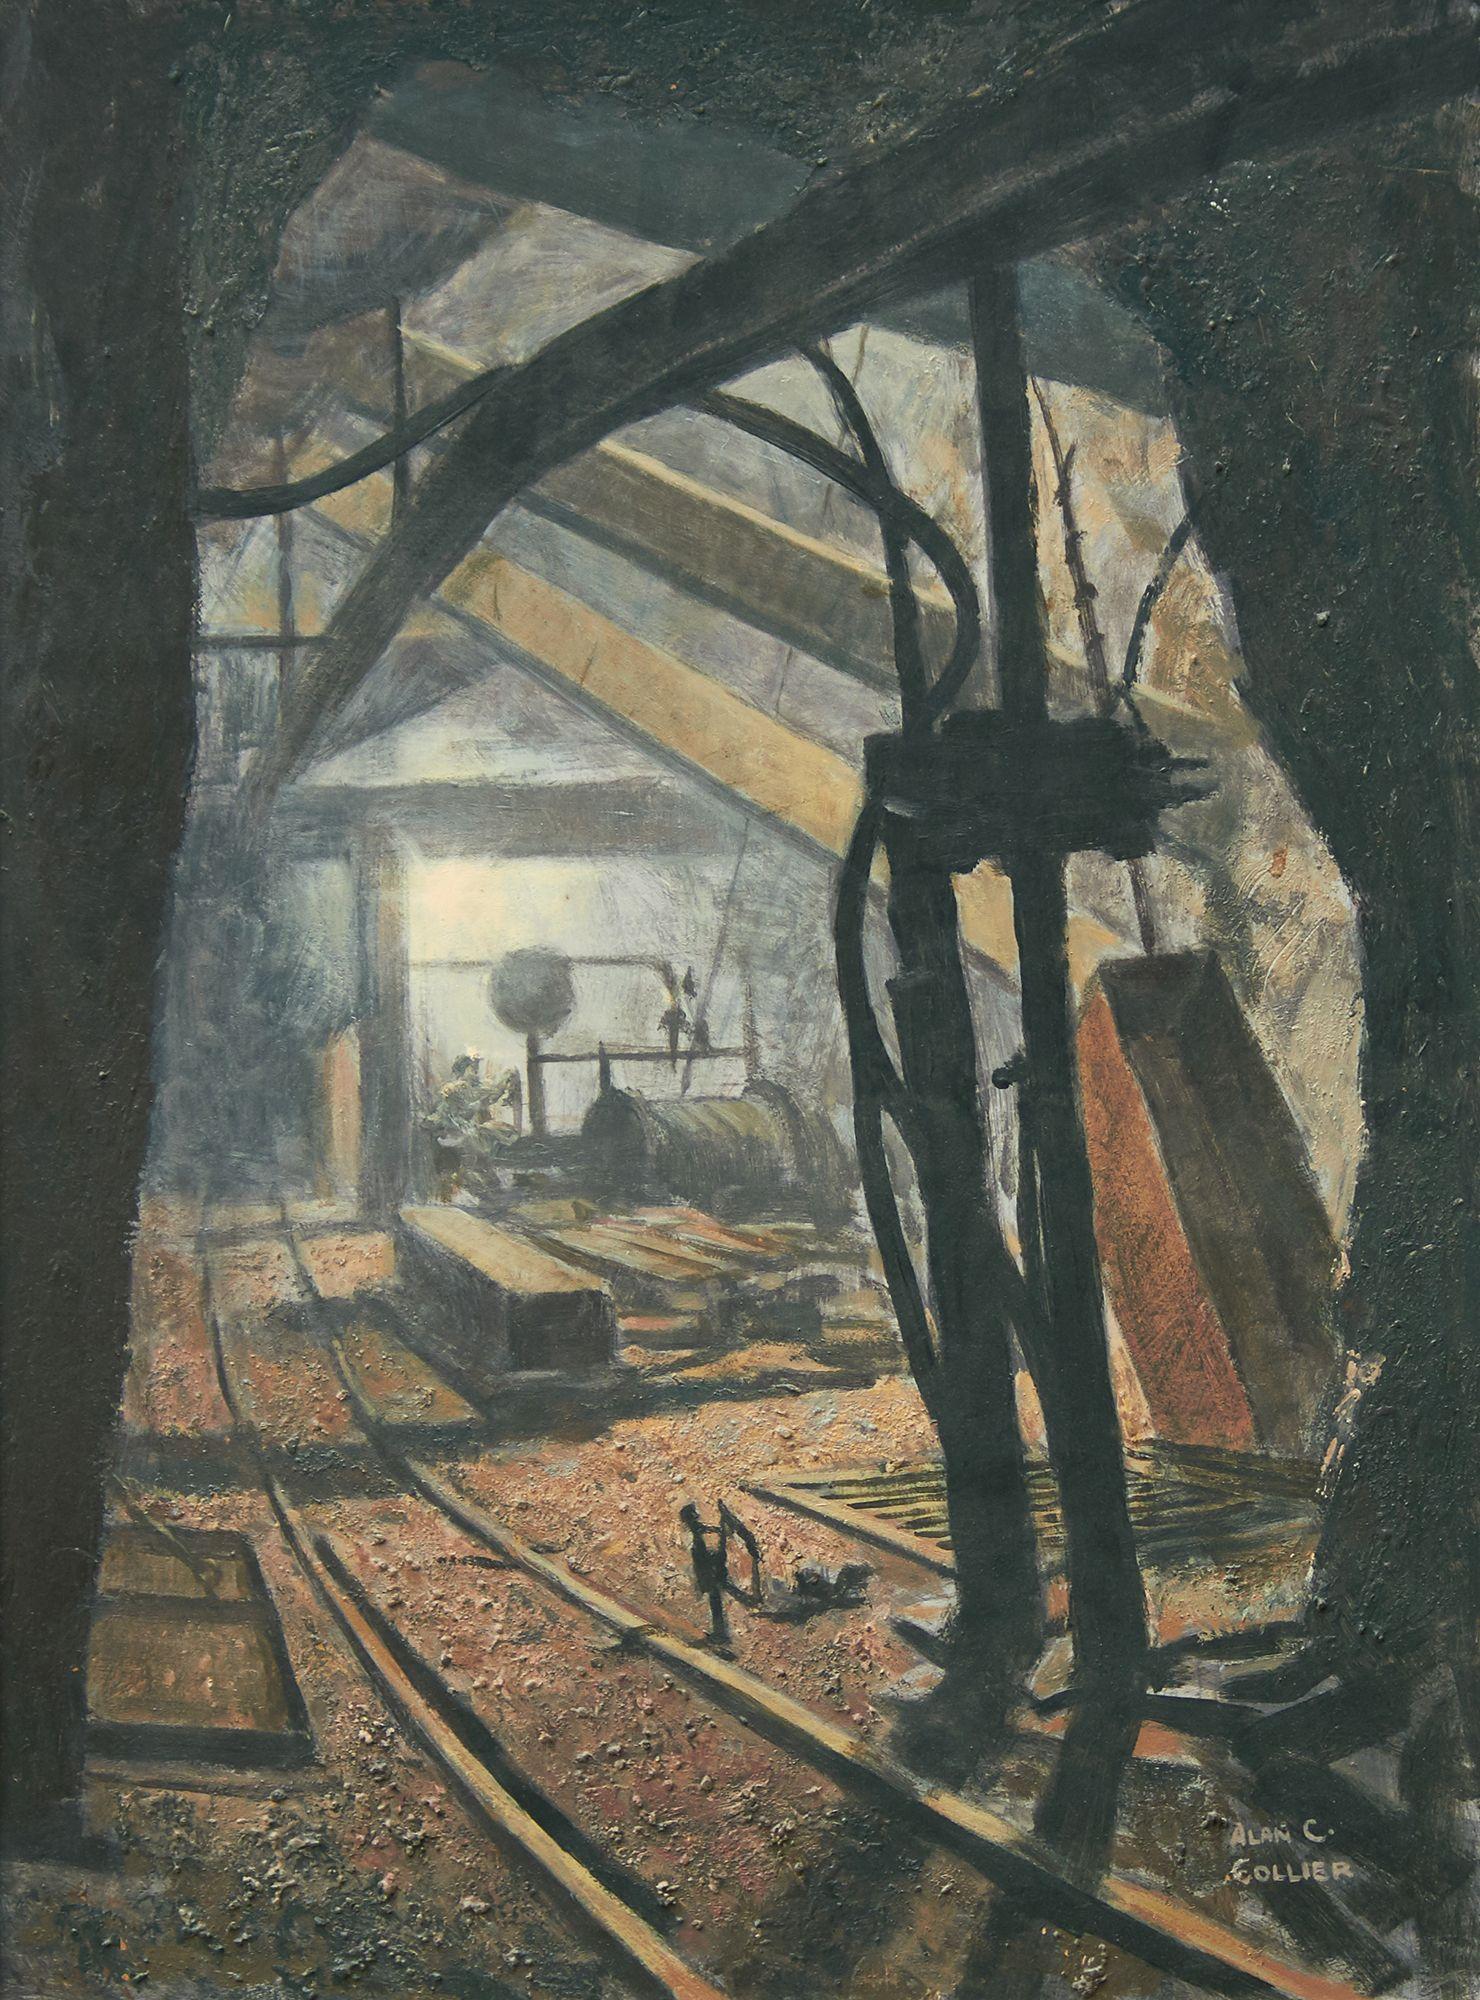 Alan Caswell Collier (19111990) The 4025 Hoist